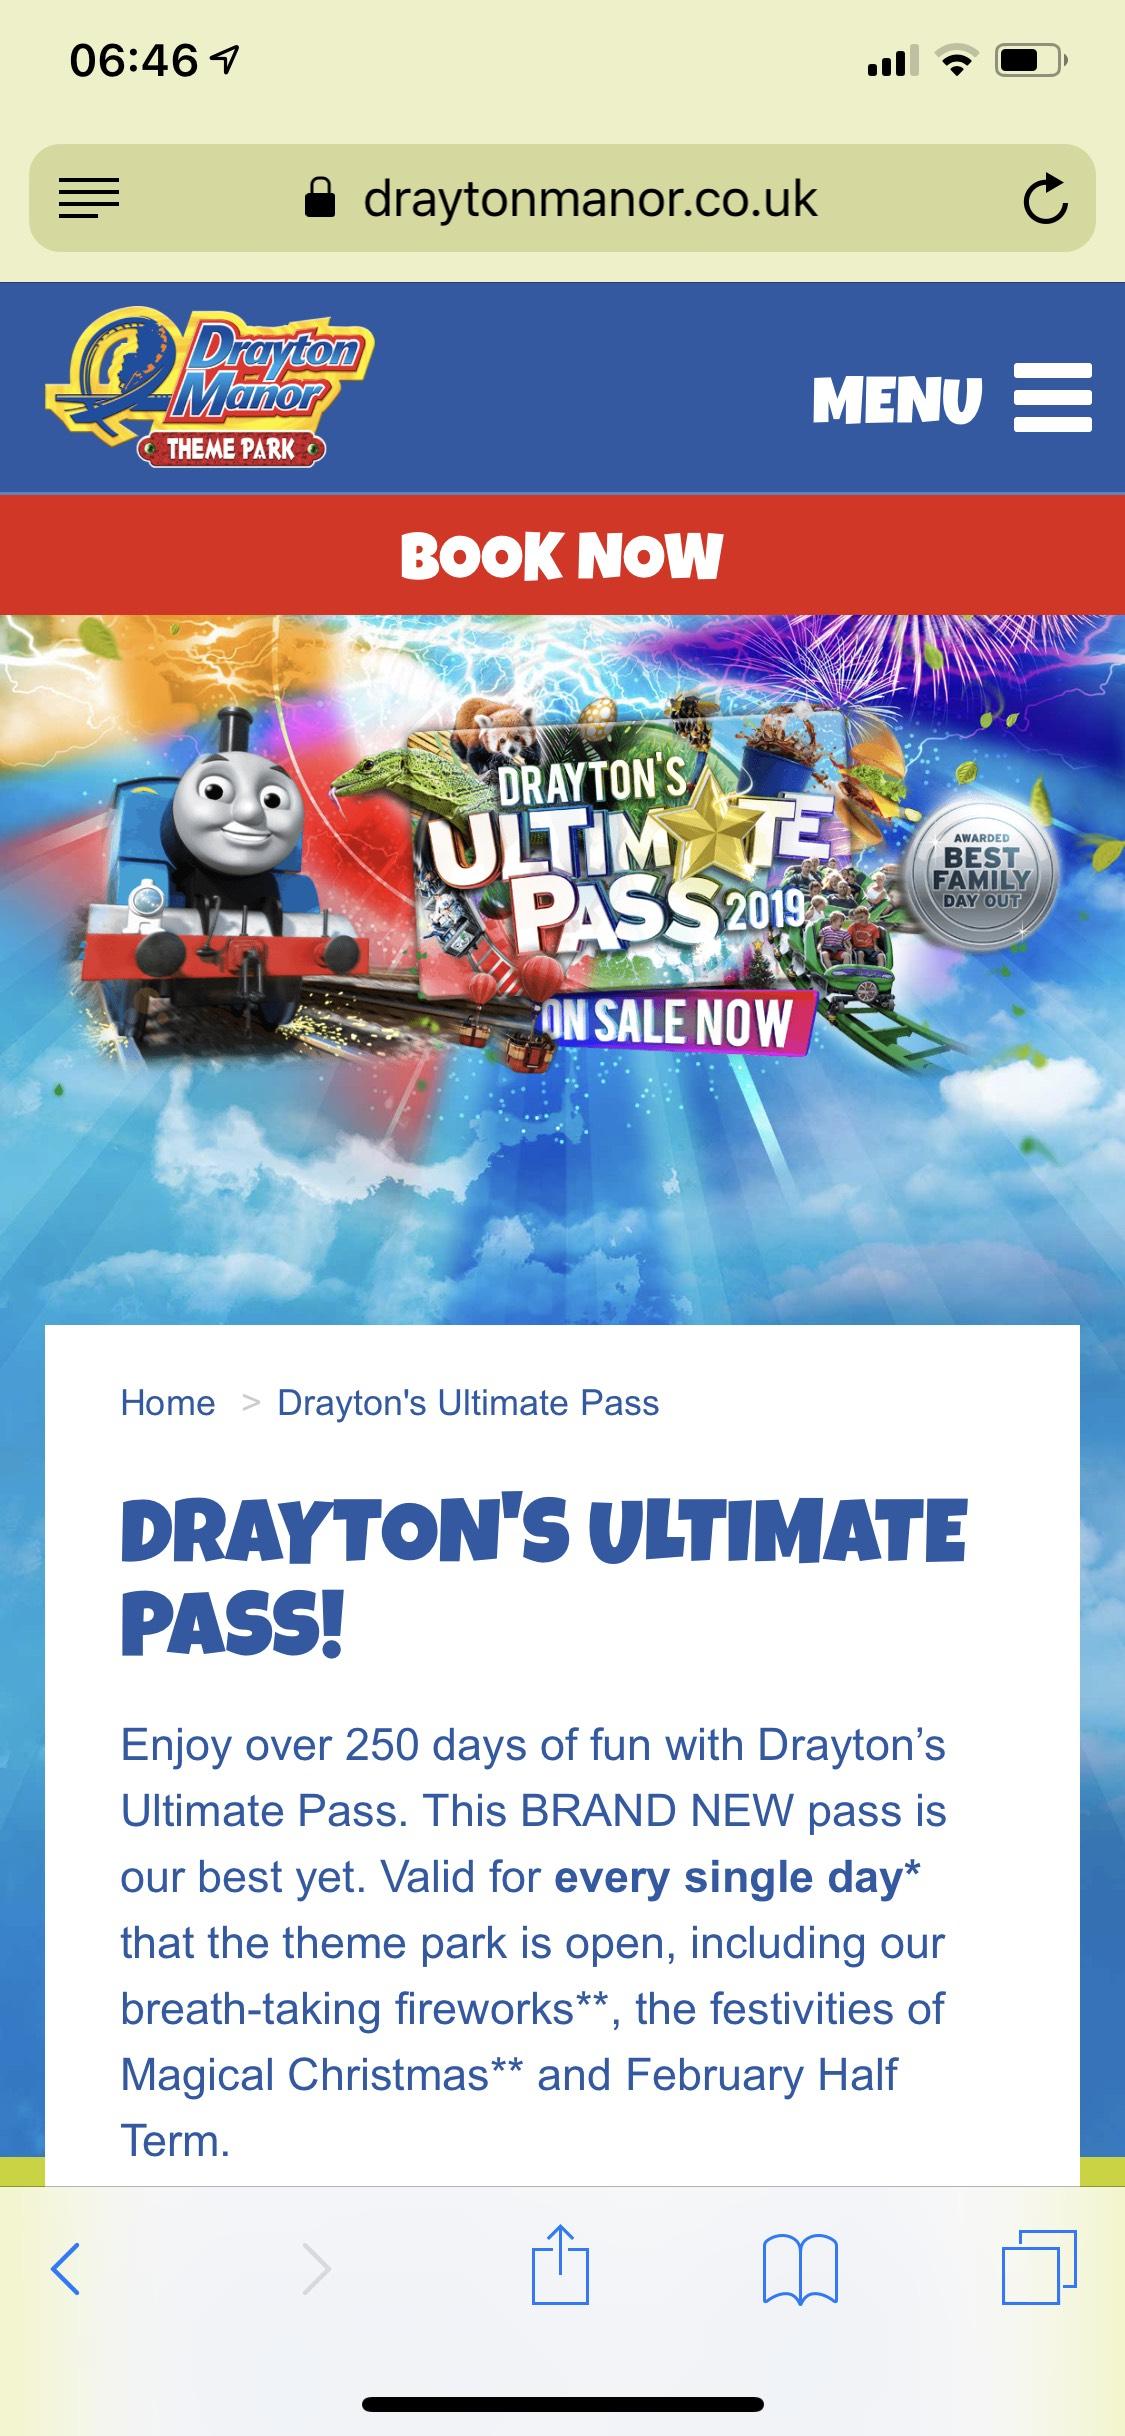 DRAYTON'S ULTIMATE PASS £110 !